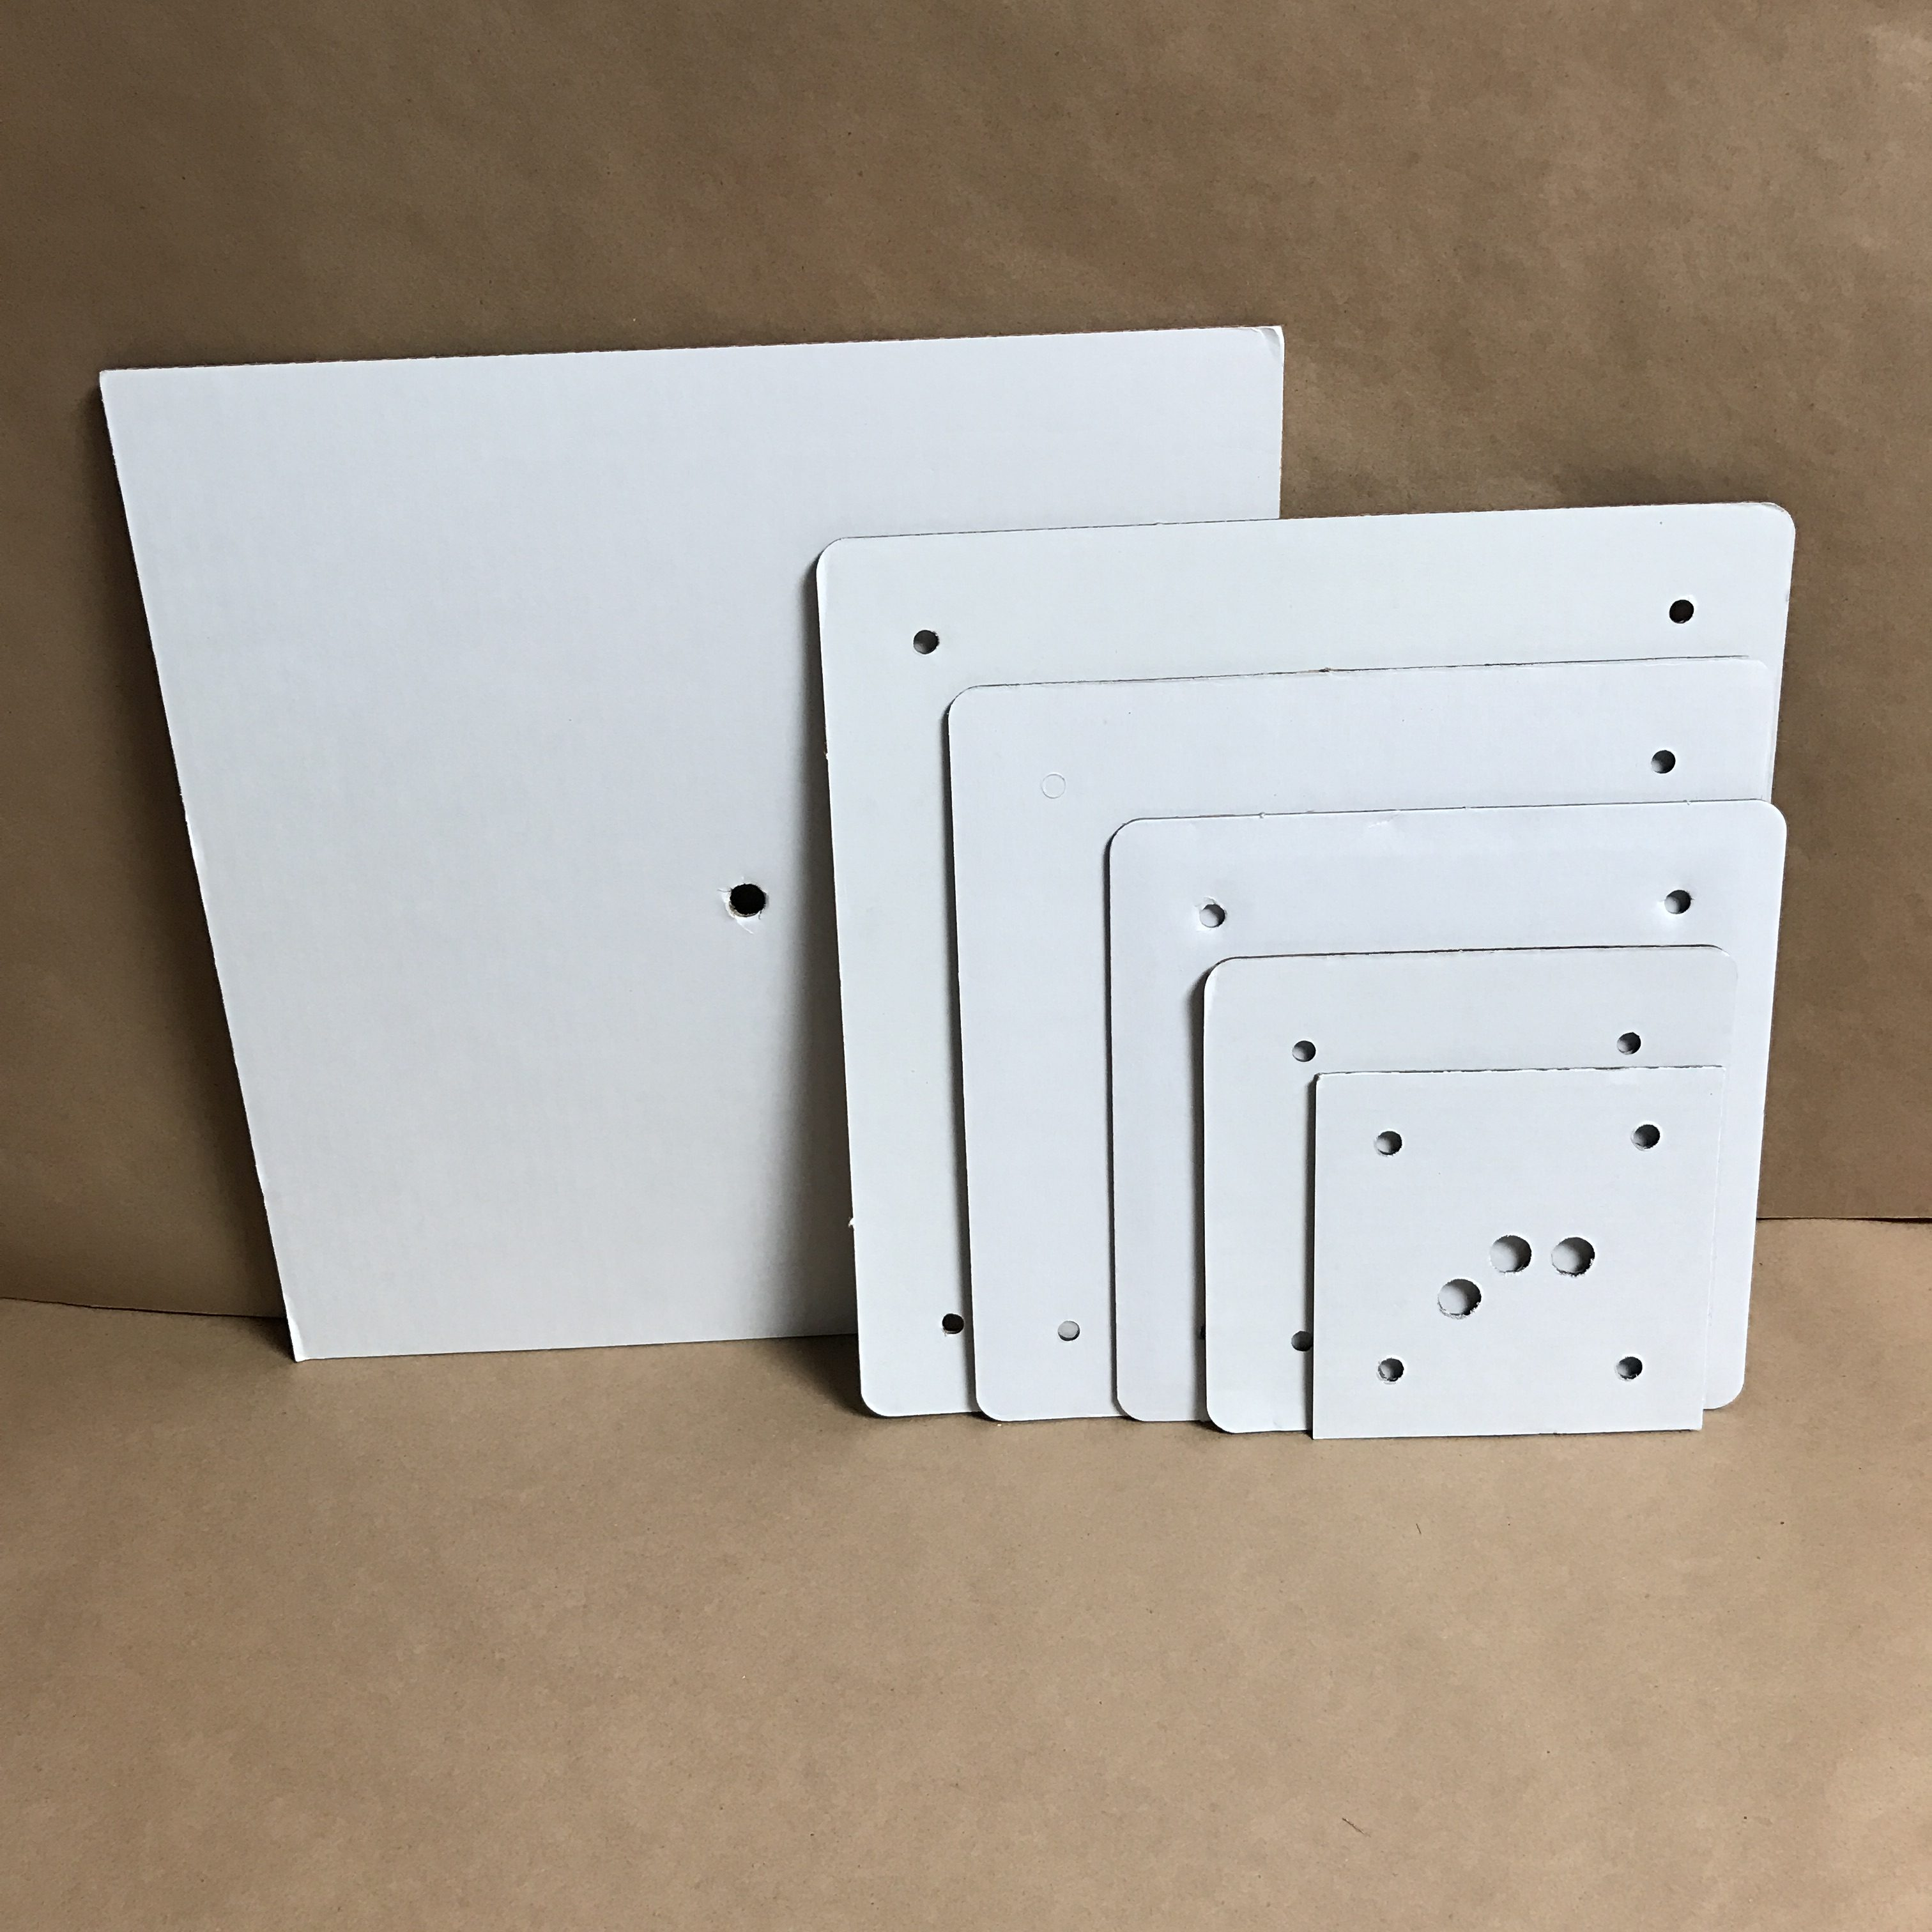 16-14-12-10-8-6 inch square disposable cake boards